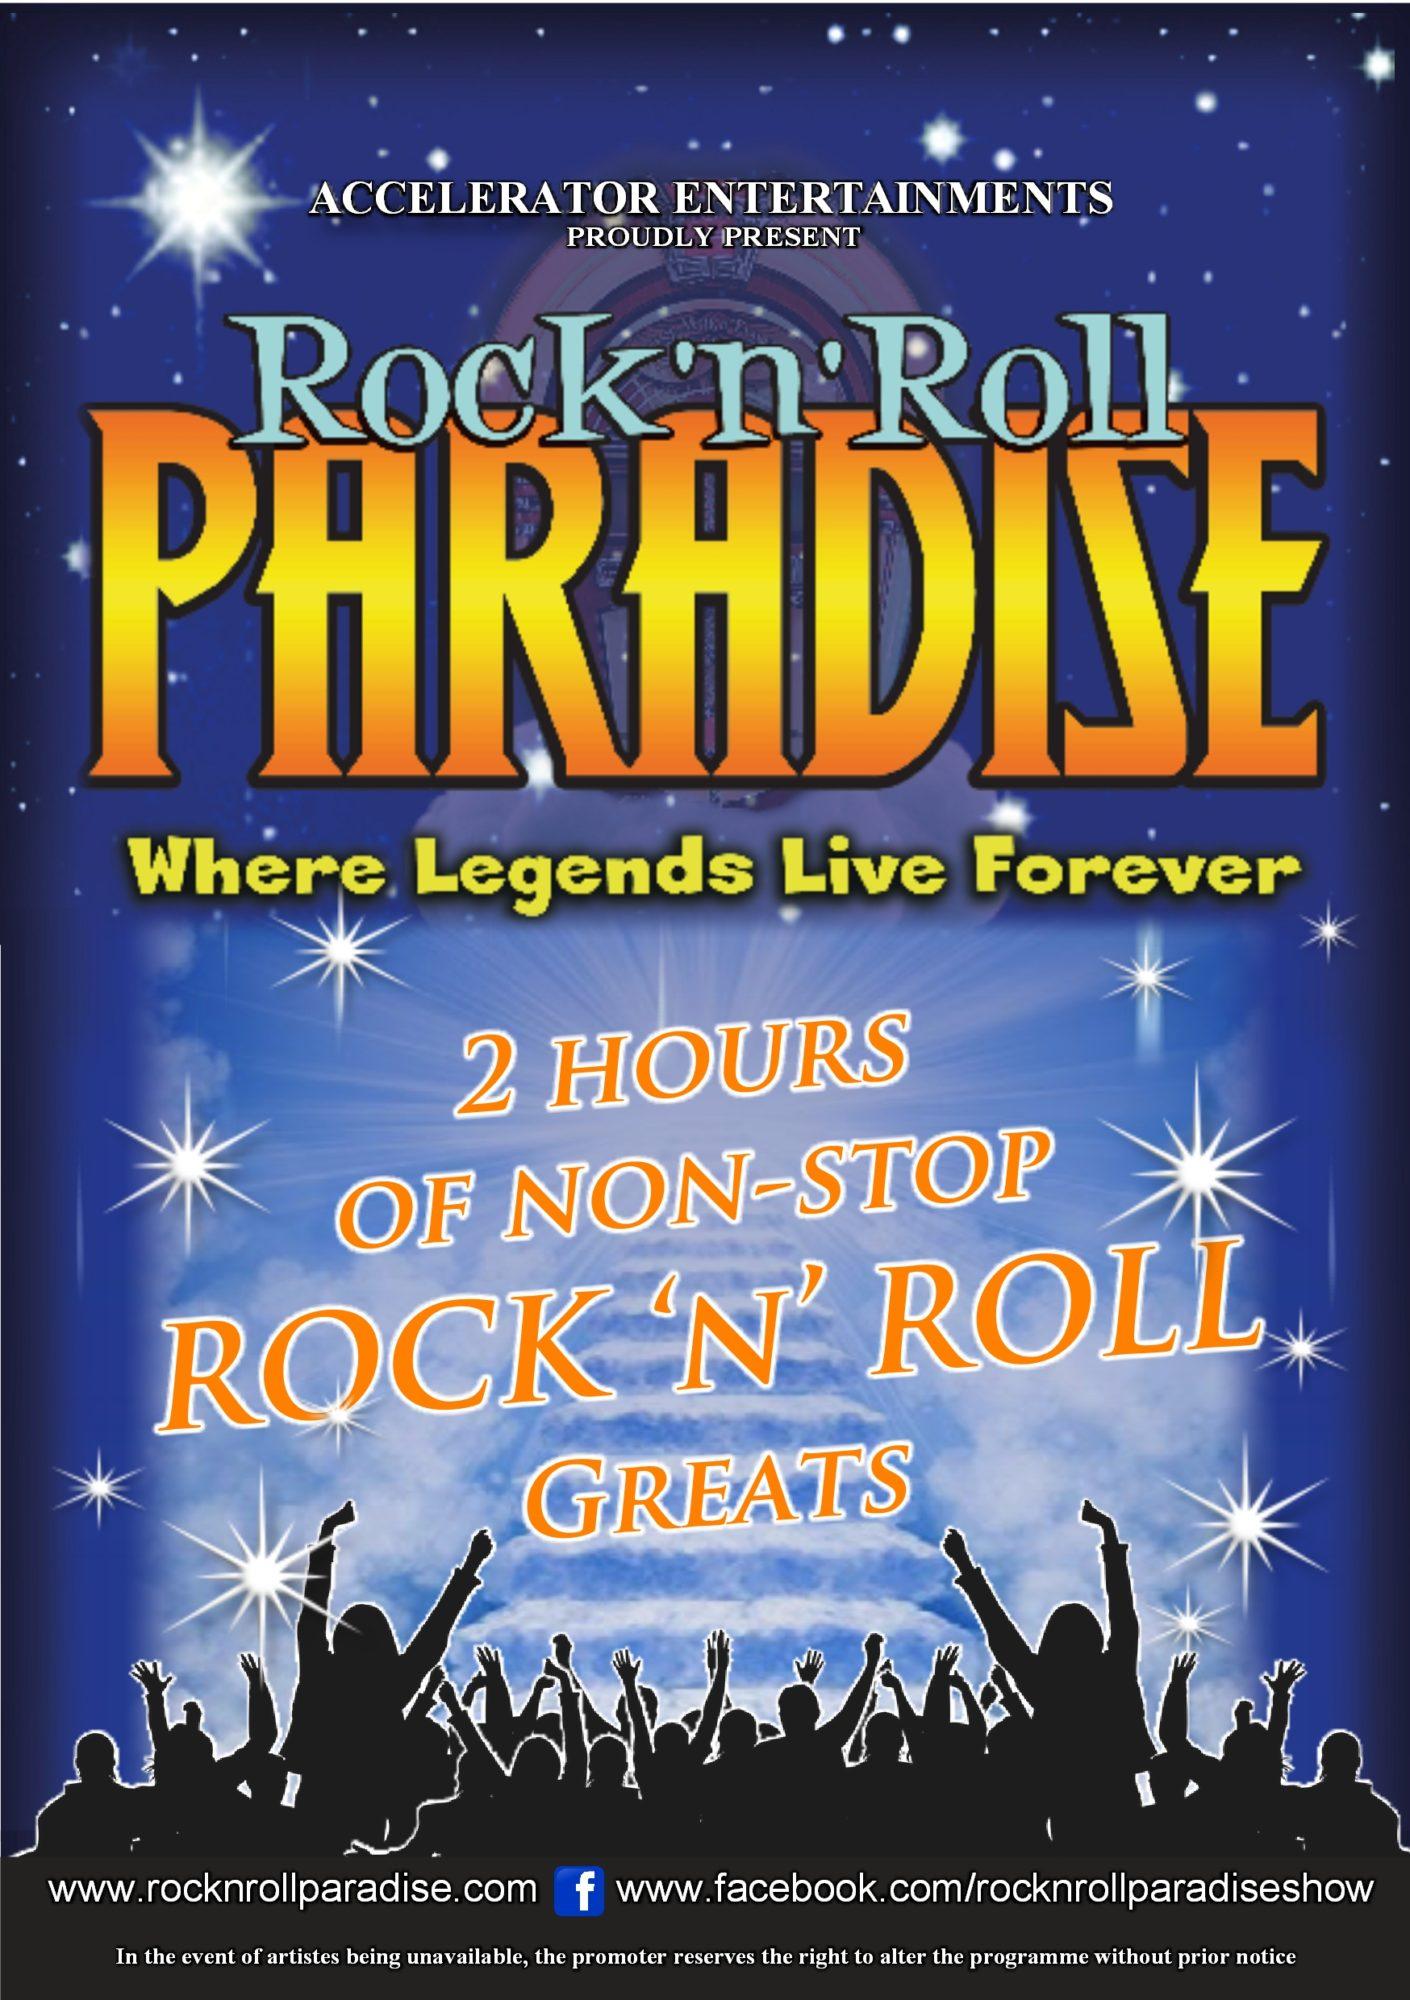 ROCK N ROLL PARADISE